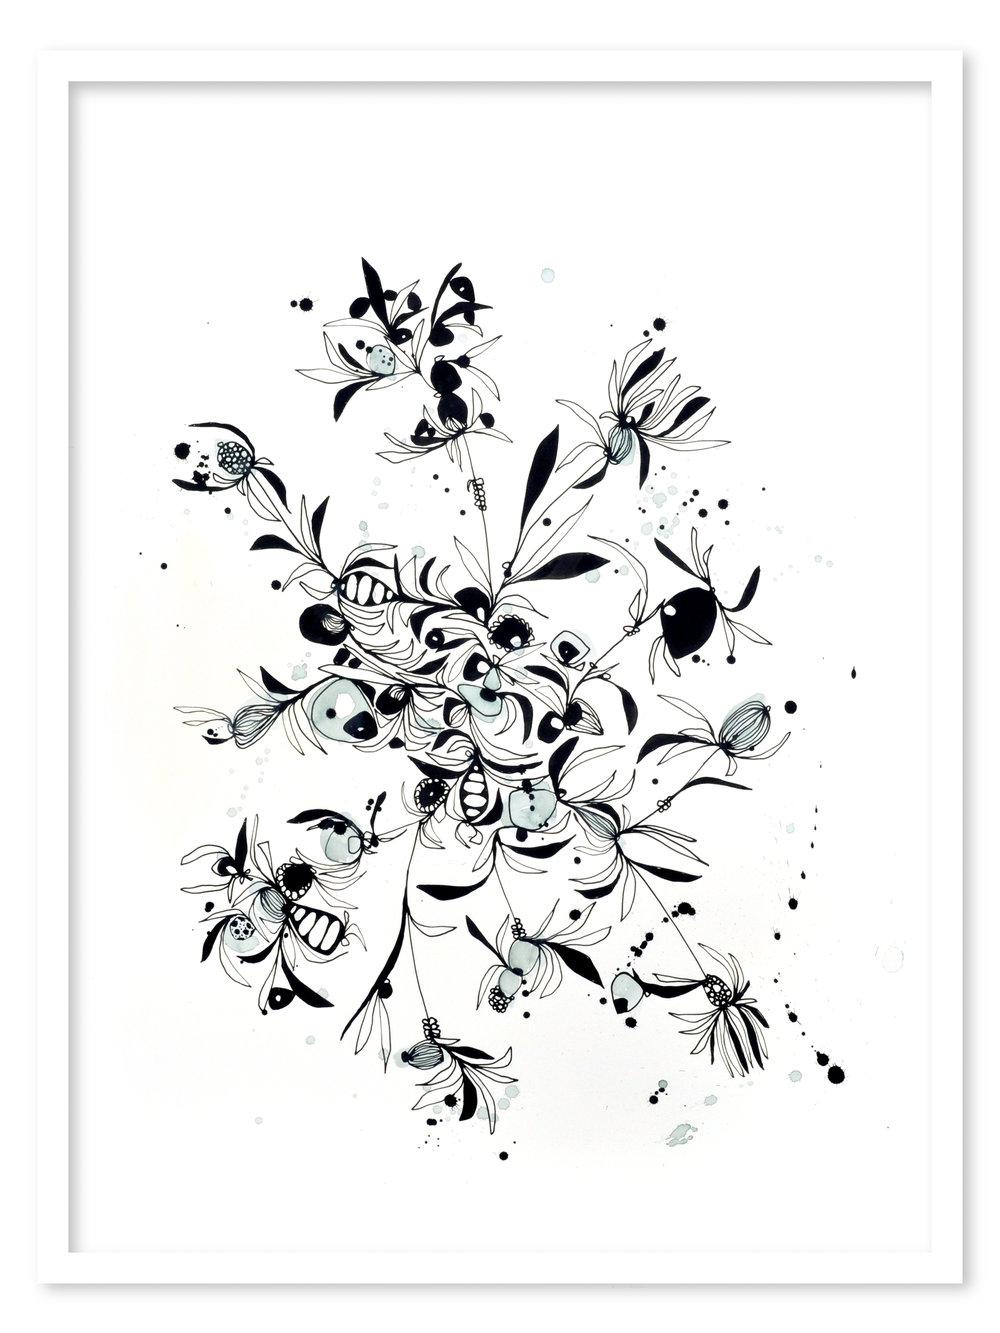 1000x1333 Husks, Seeds Amp Weeds The Studio Of Neil Powell